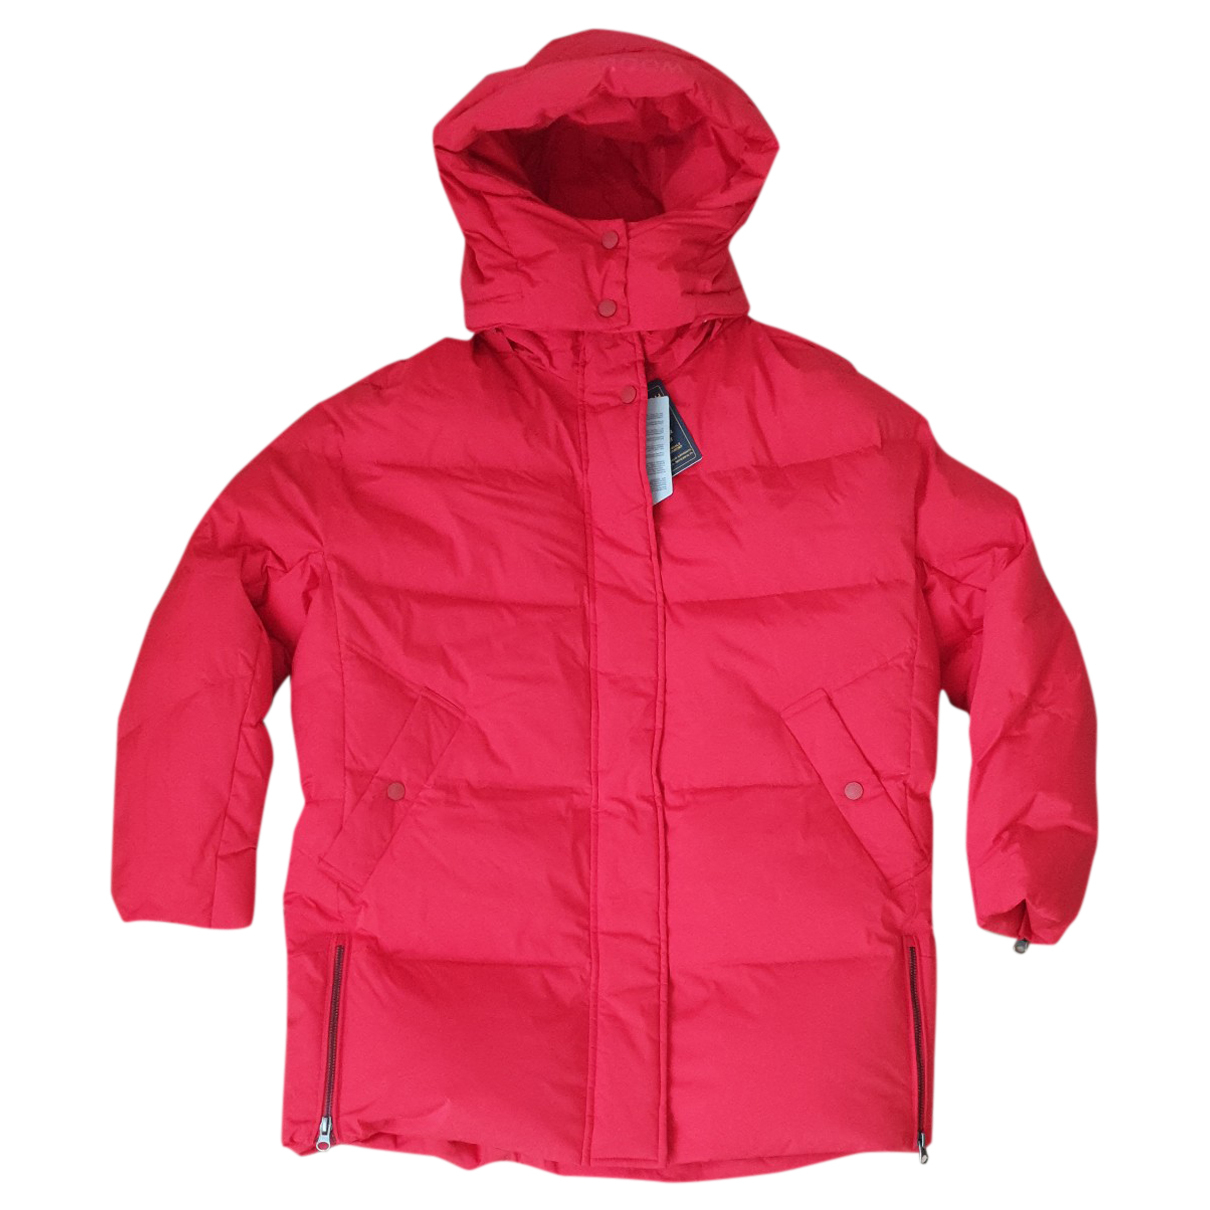 Woolrich \N Jacke in  Rot Polyester